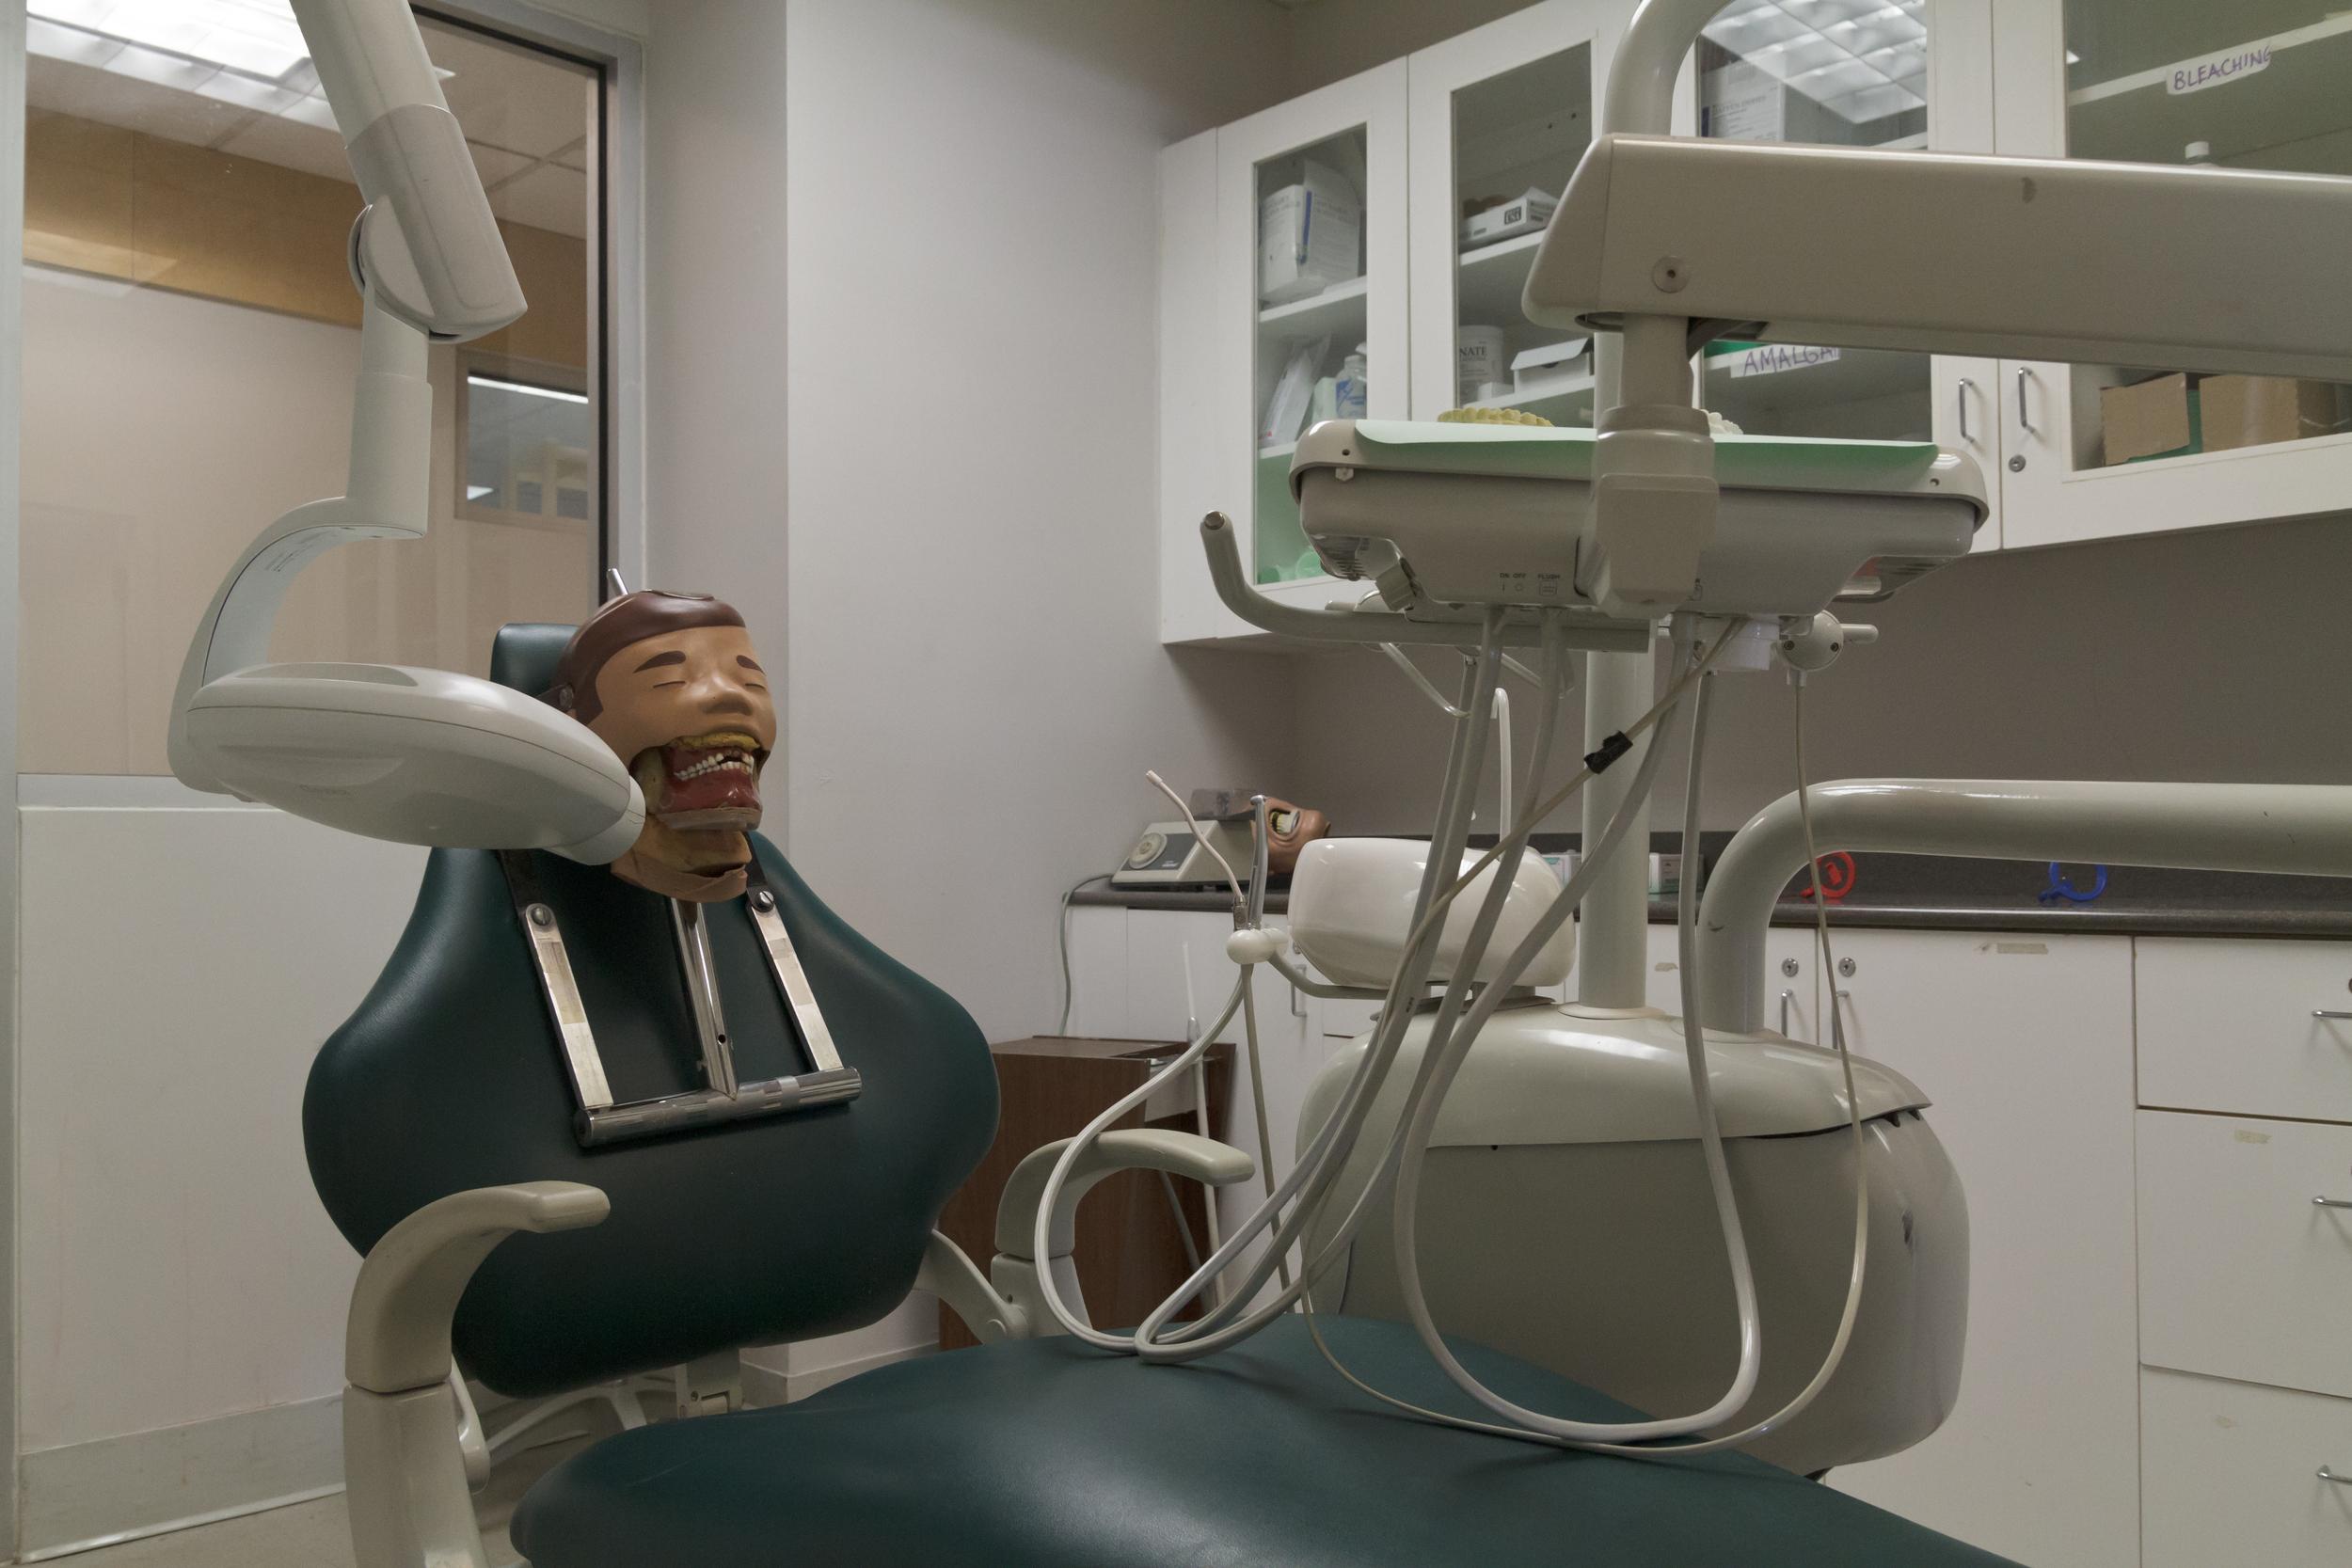 NYSDMA Dental Assistant training room and equipment